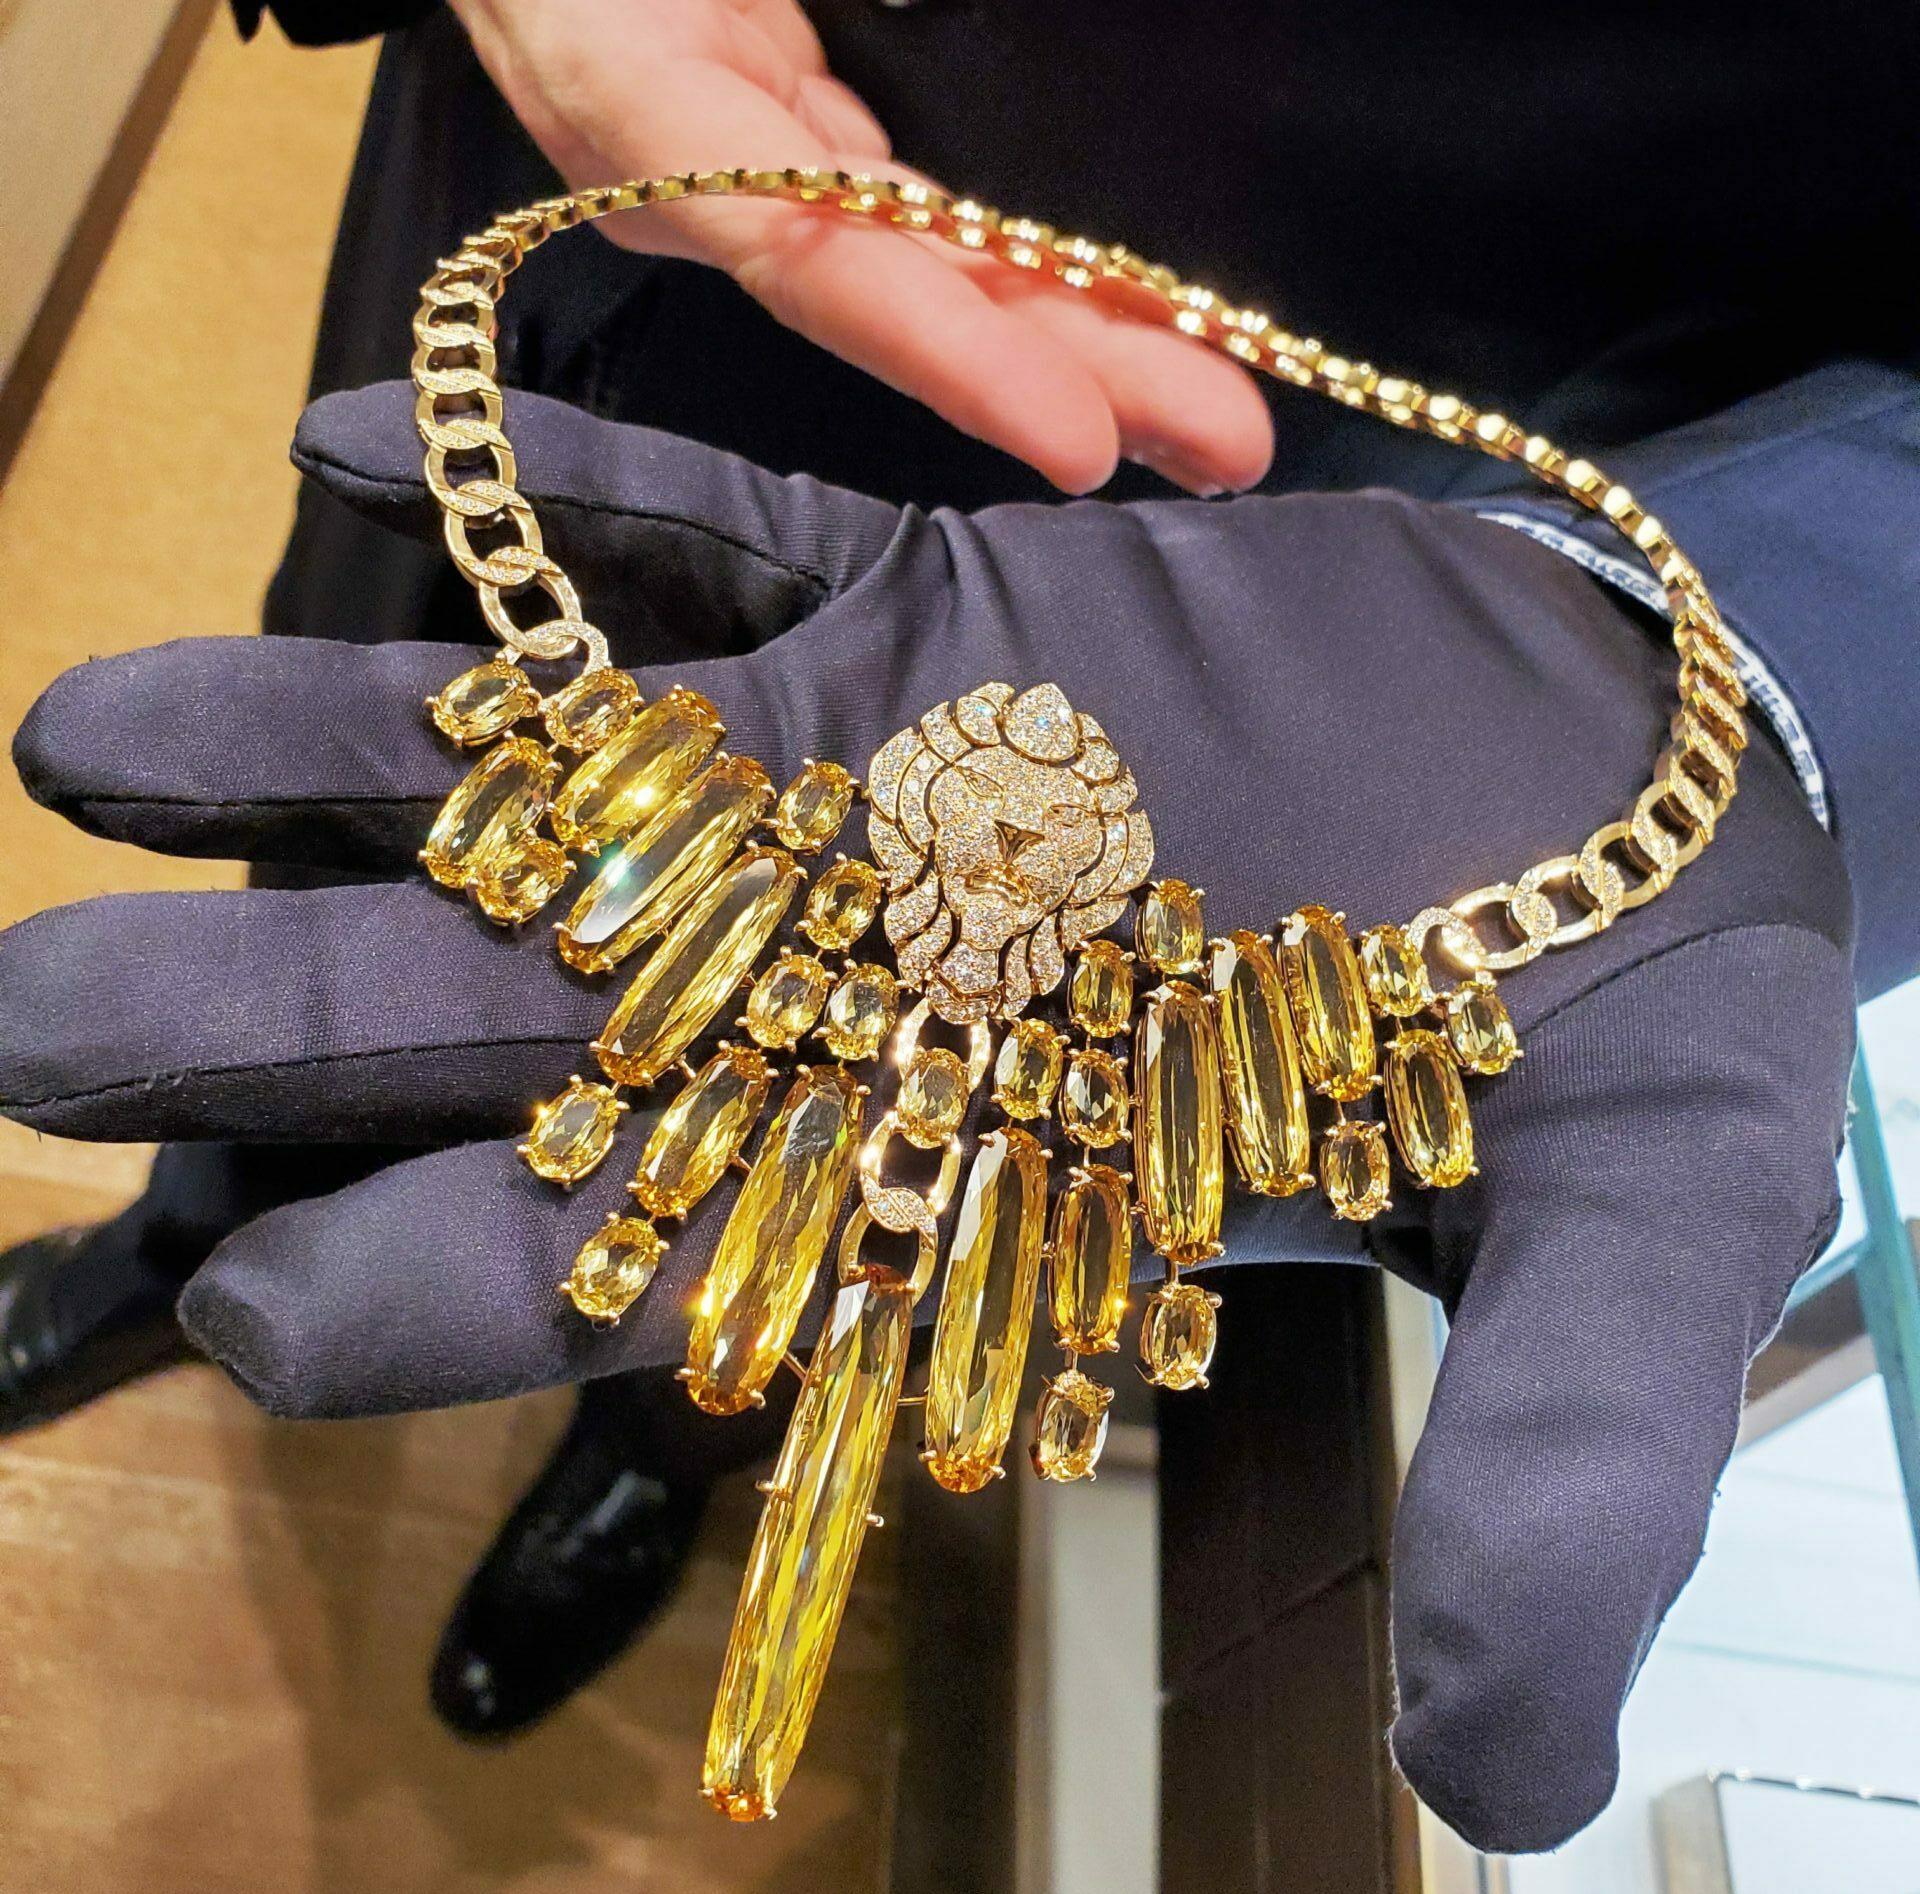 chanel, holt renfrew, mona rose butler, helen siwak, vancouver, bc, vancity, yvr, luxury, ecoluxluv, folioyvr, luxury